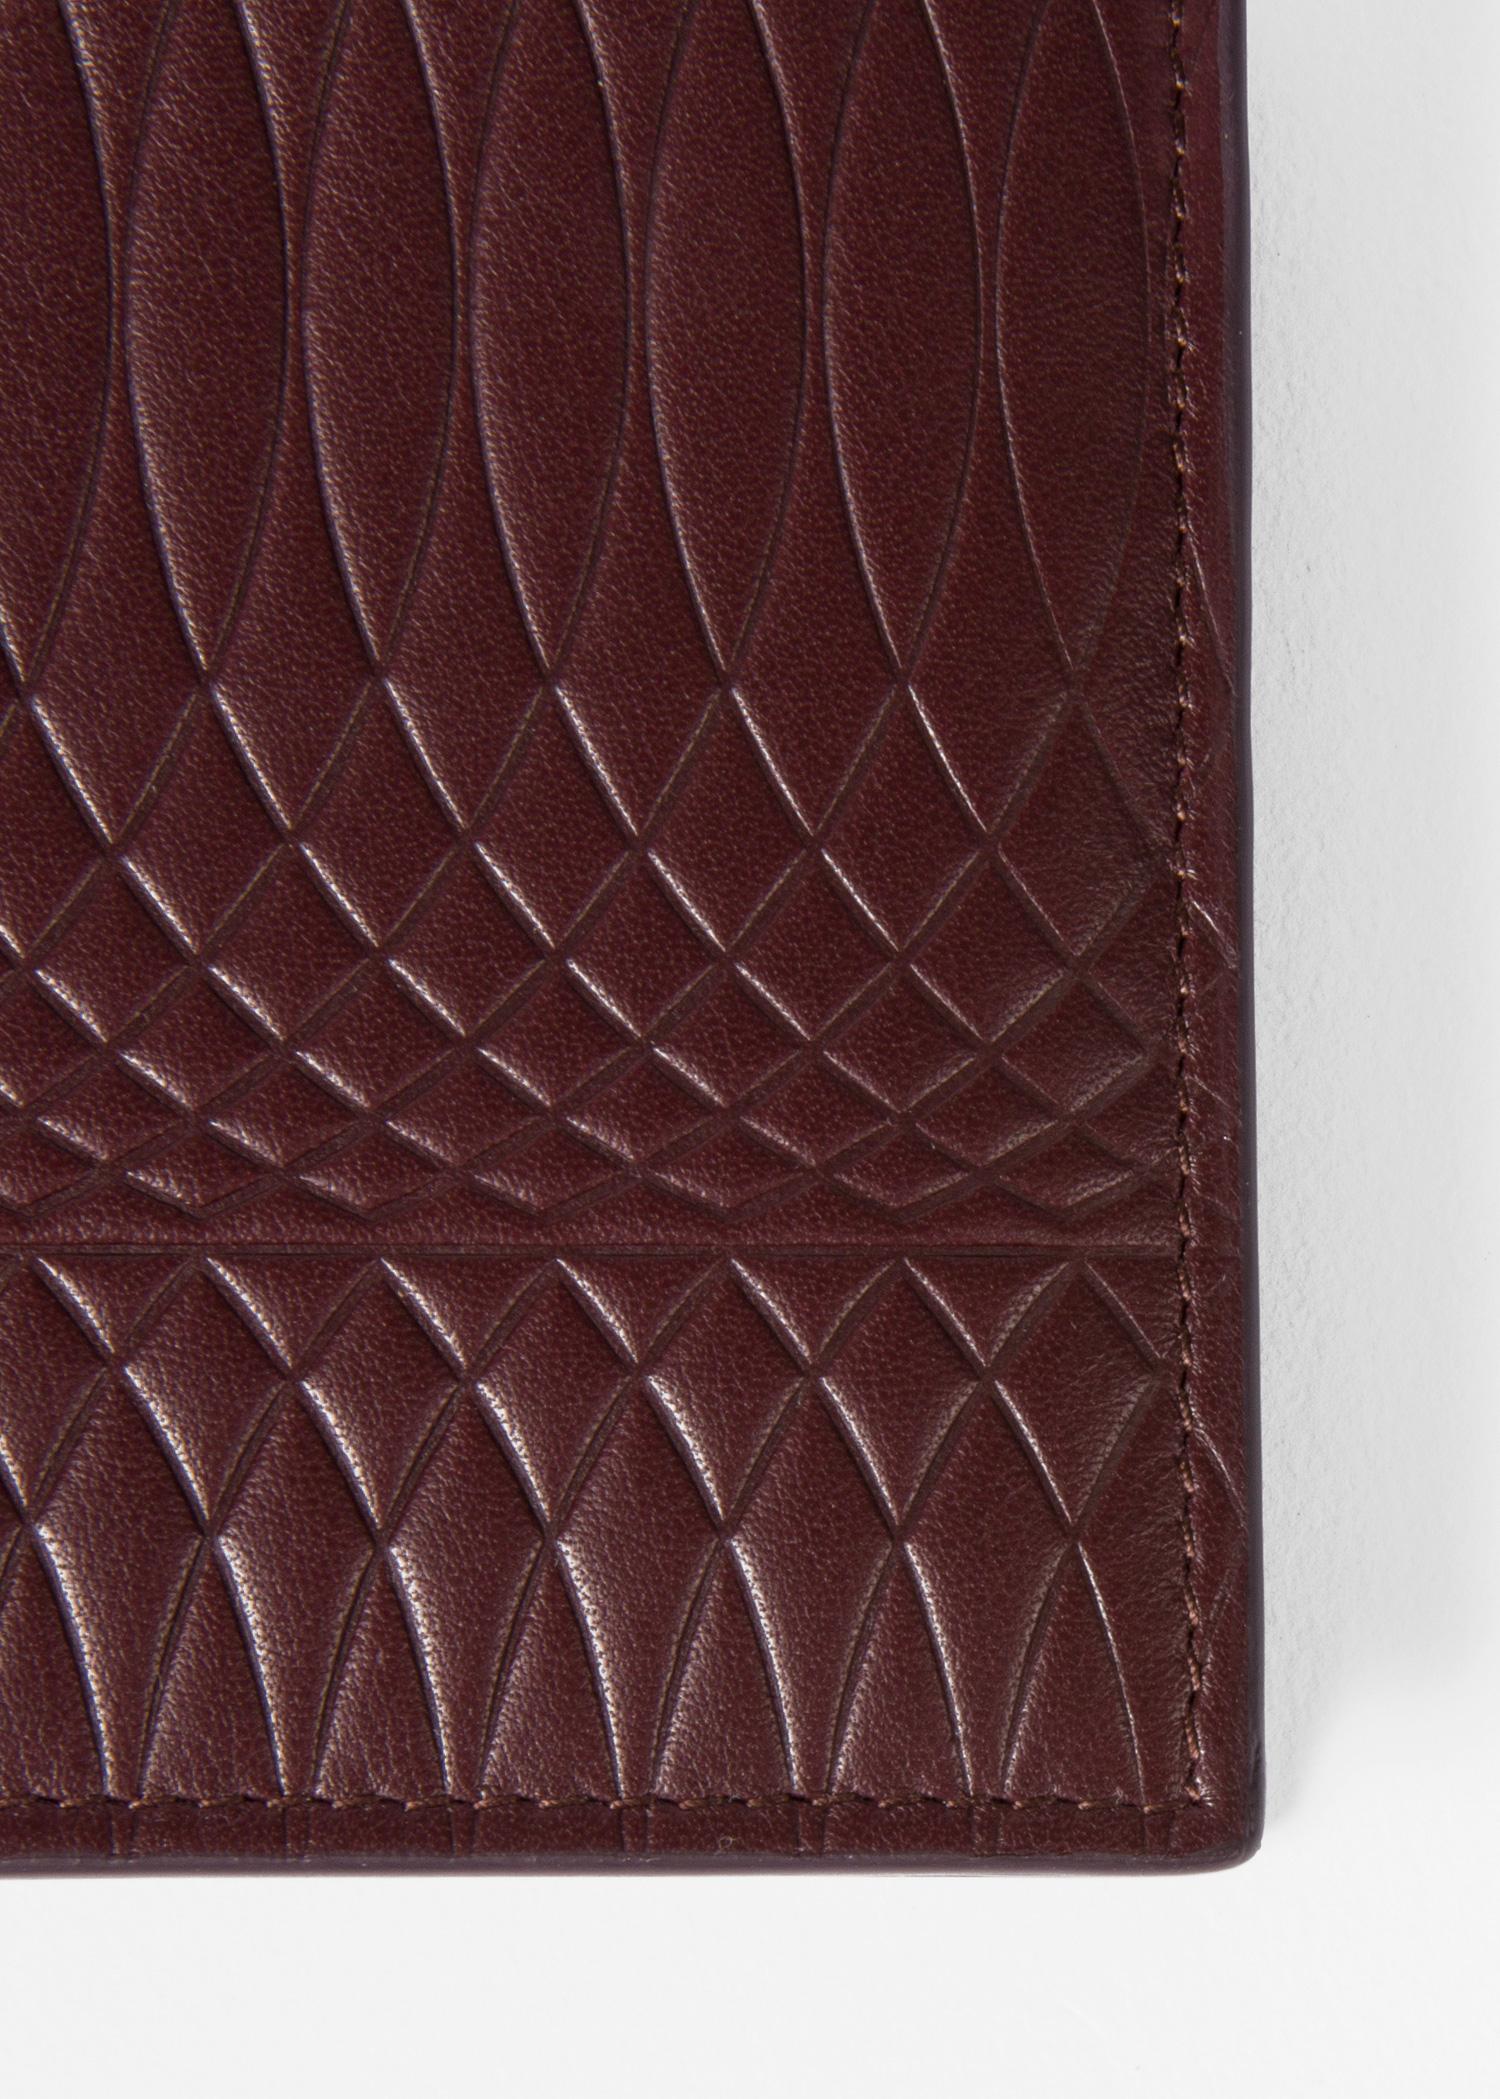 cd6f9440ed25 Paul Smith No.9 Men's Damson Leather Billfold Wallet - Paul Smith US